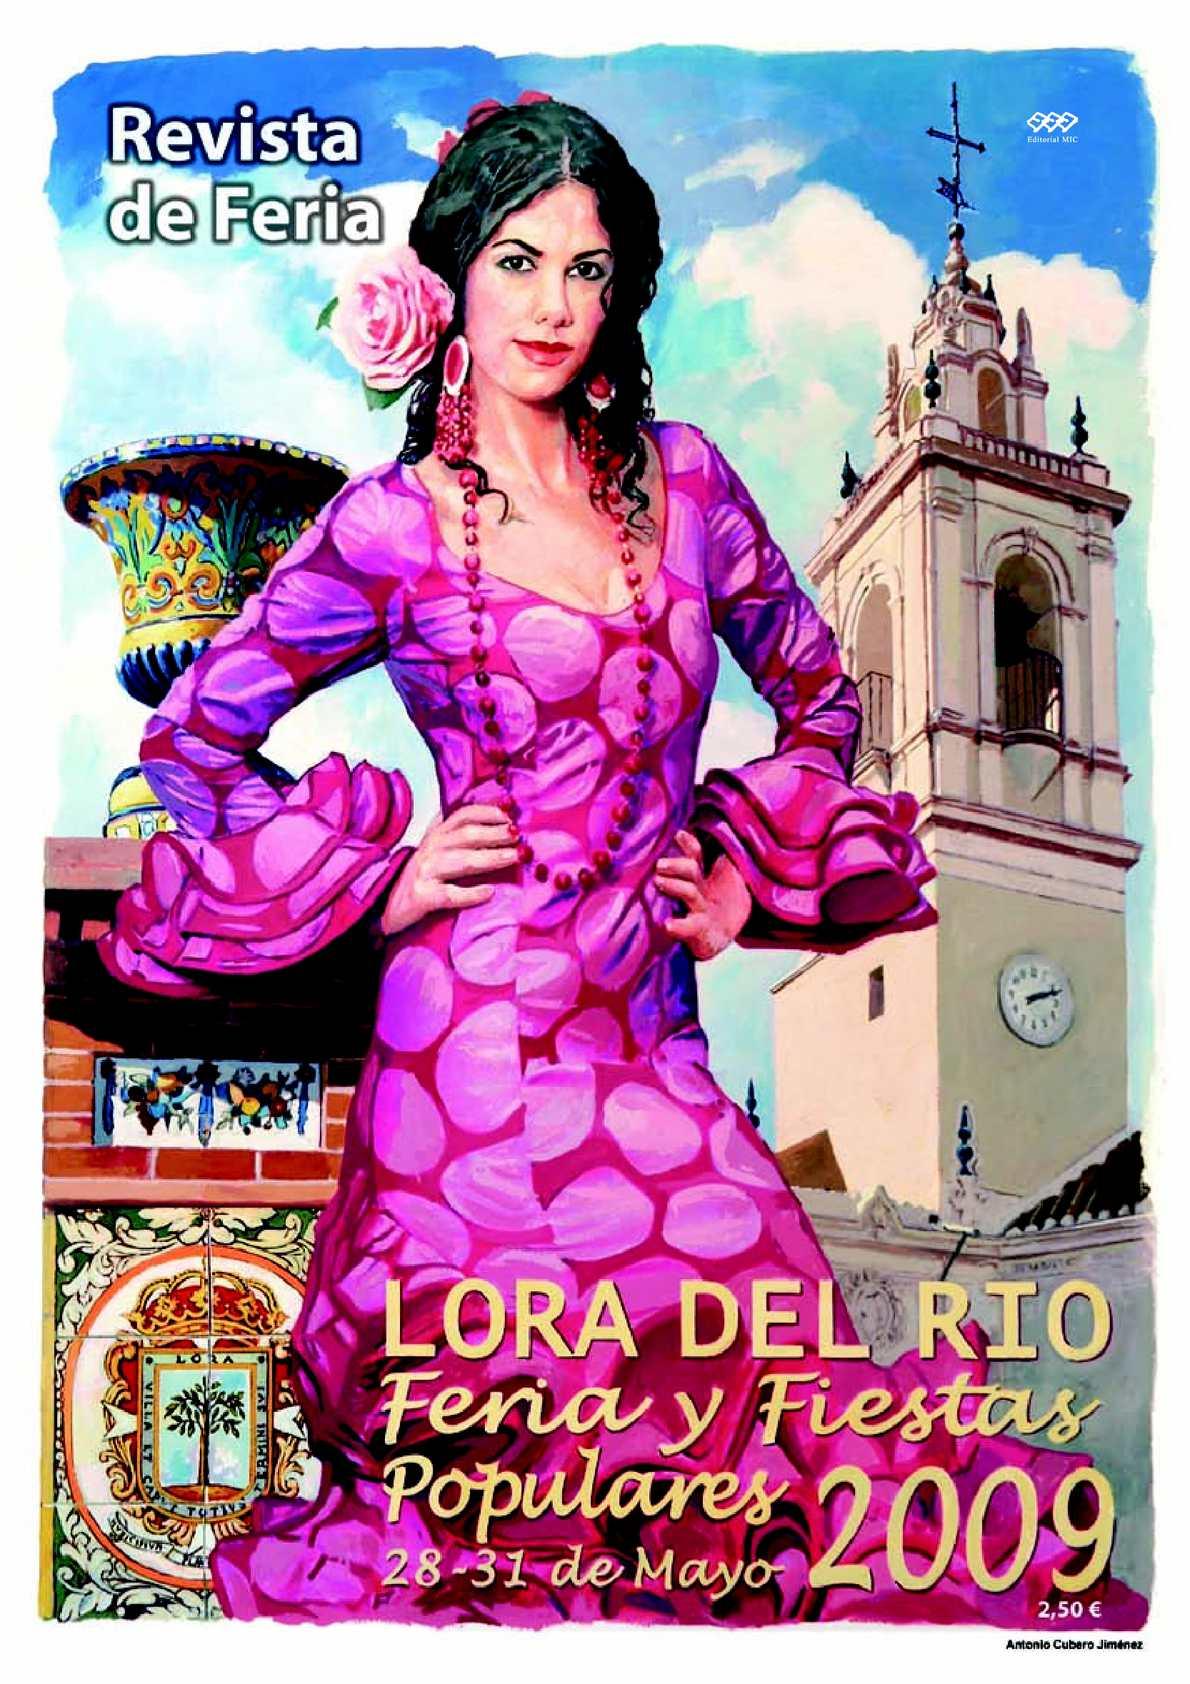 Calaméo - Revista de Feria de Lora del Río 2009